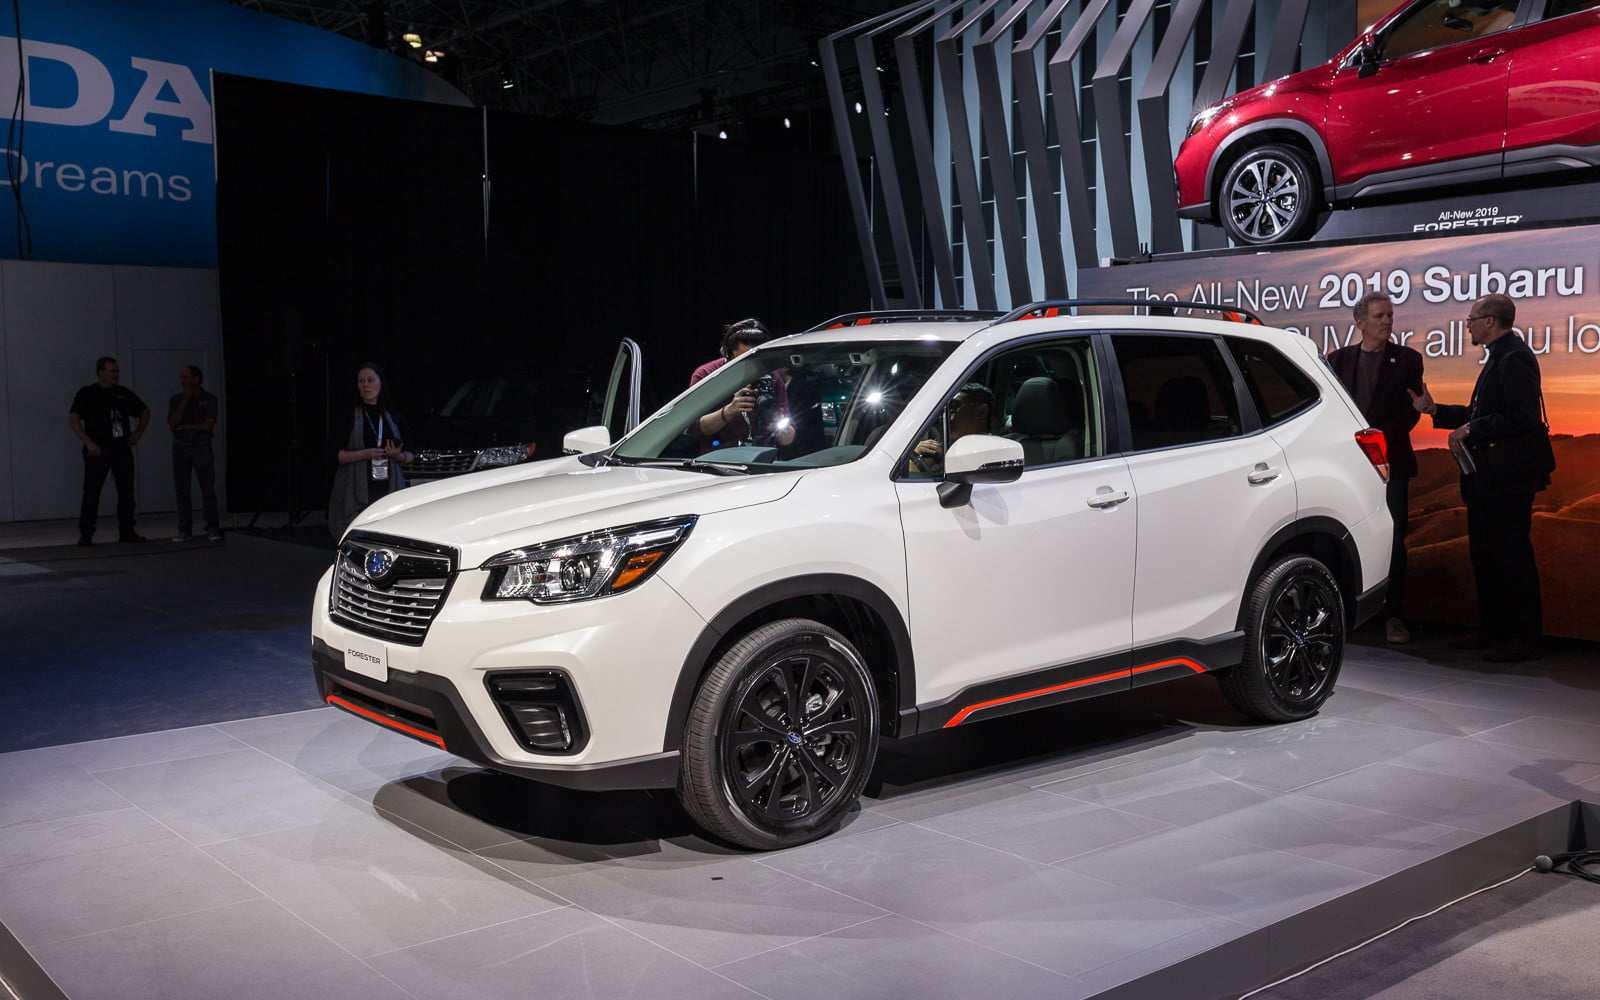 48 New 2019 Subaru Global Platform Performance for 2019 Subaru Global Platform